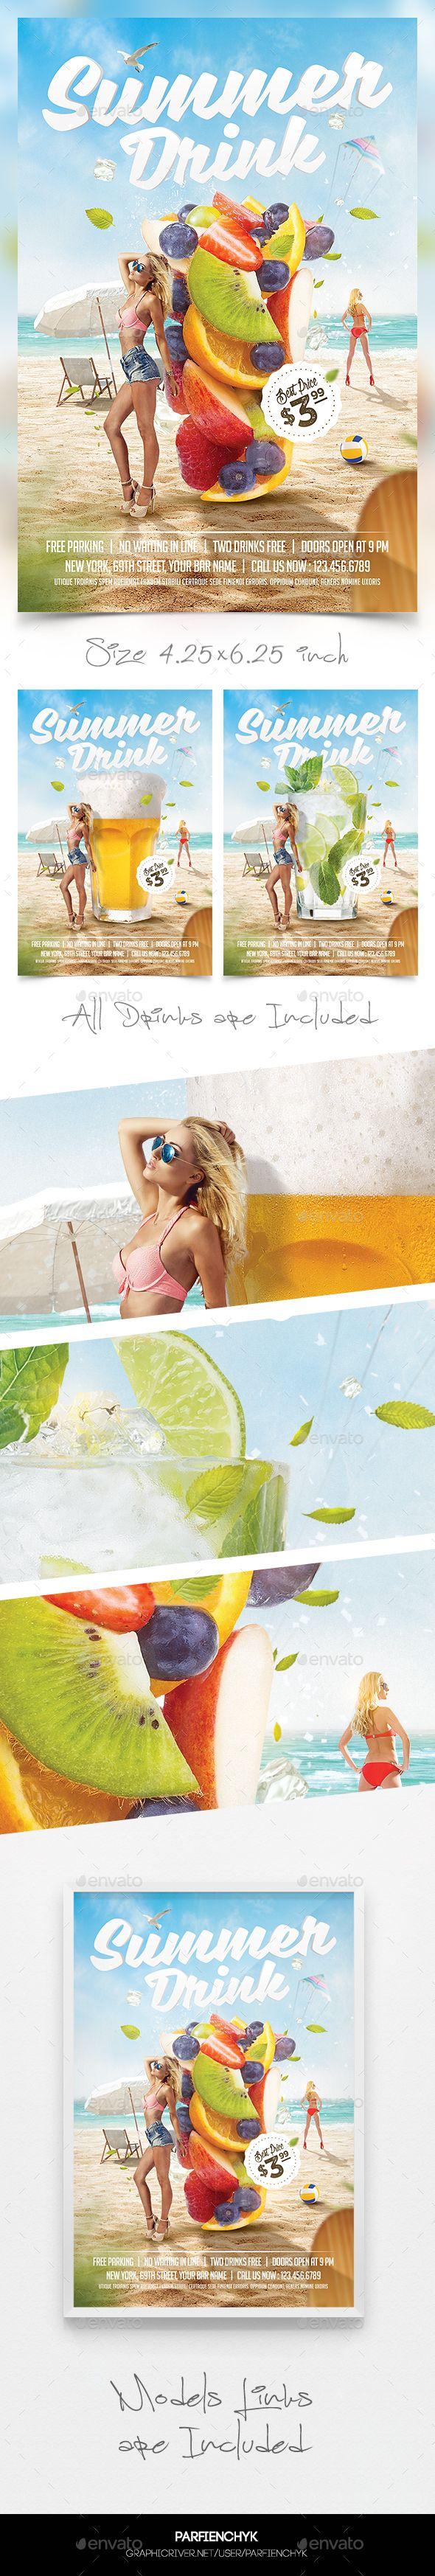 3 in 1 Summer Drinks Flyer Template PSD. Download here: http://graphicriver.net/item/3in1-summer-drinks-flyer-template/16182795?ref=ksioks